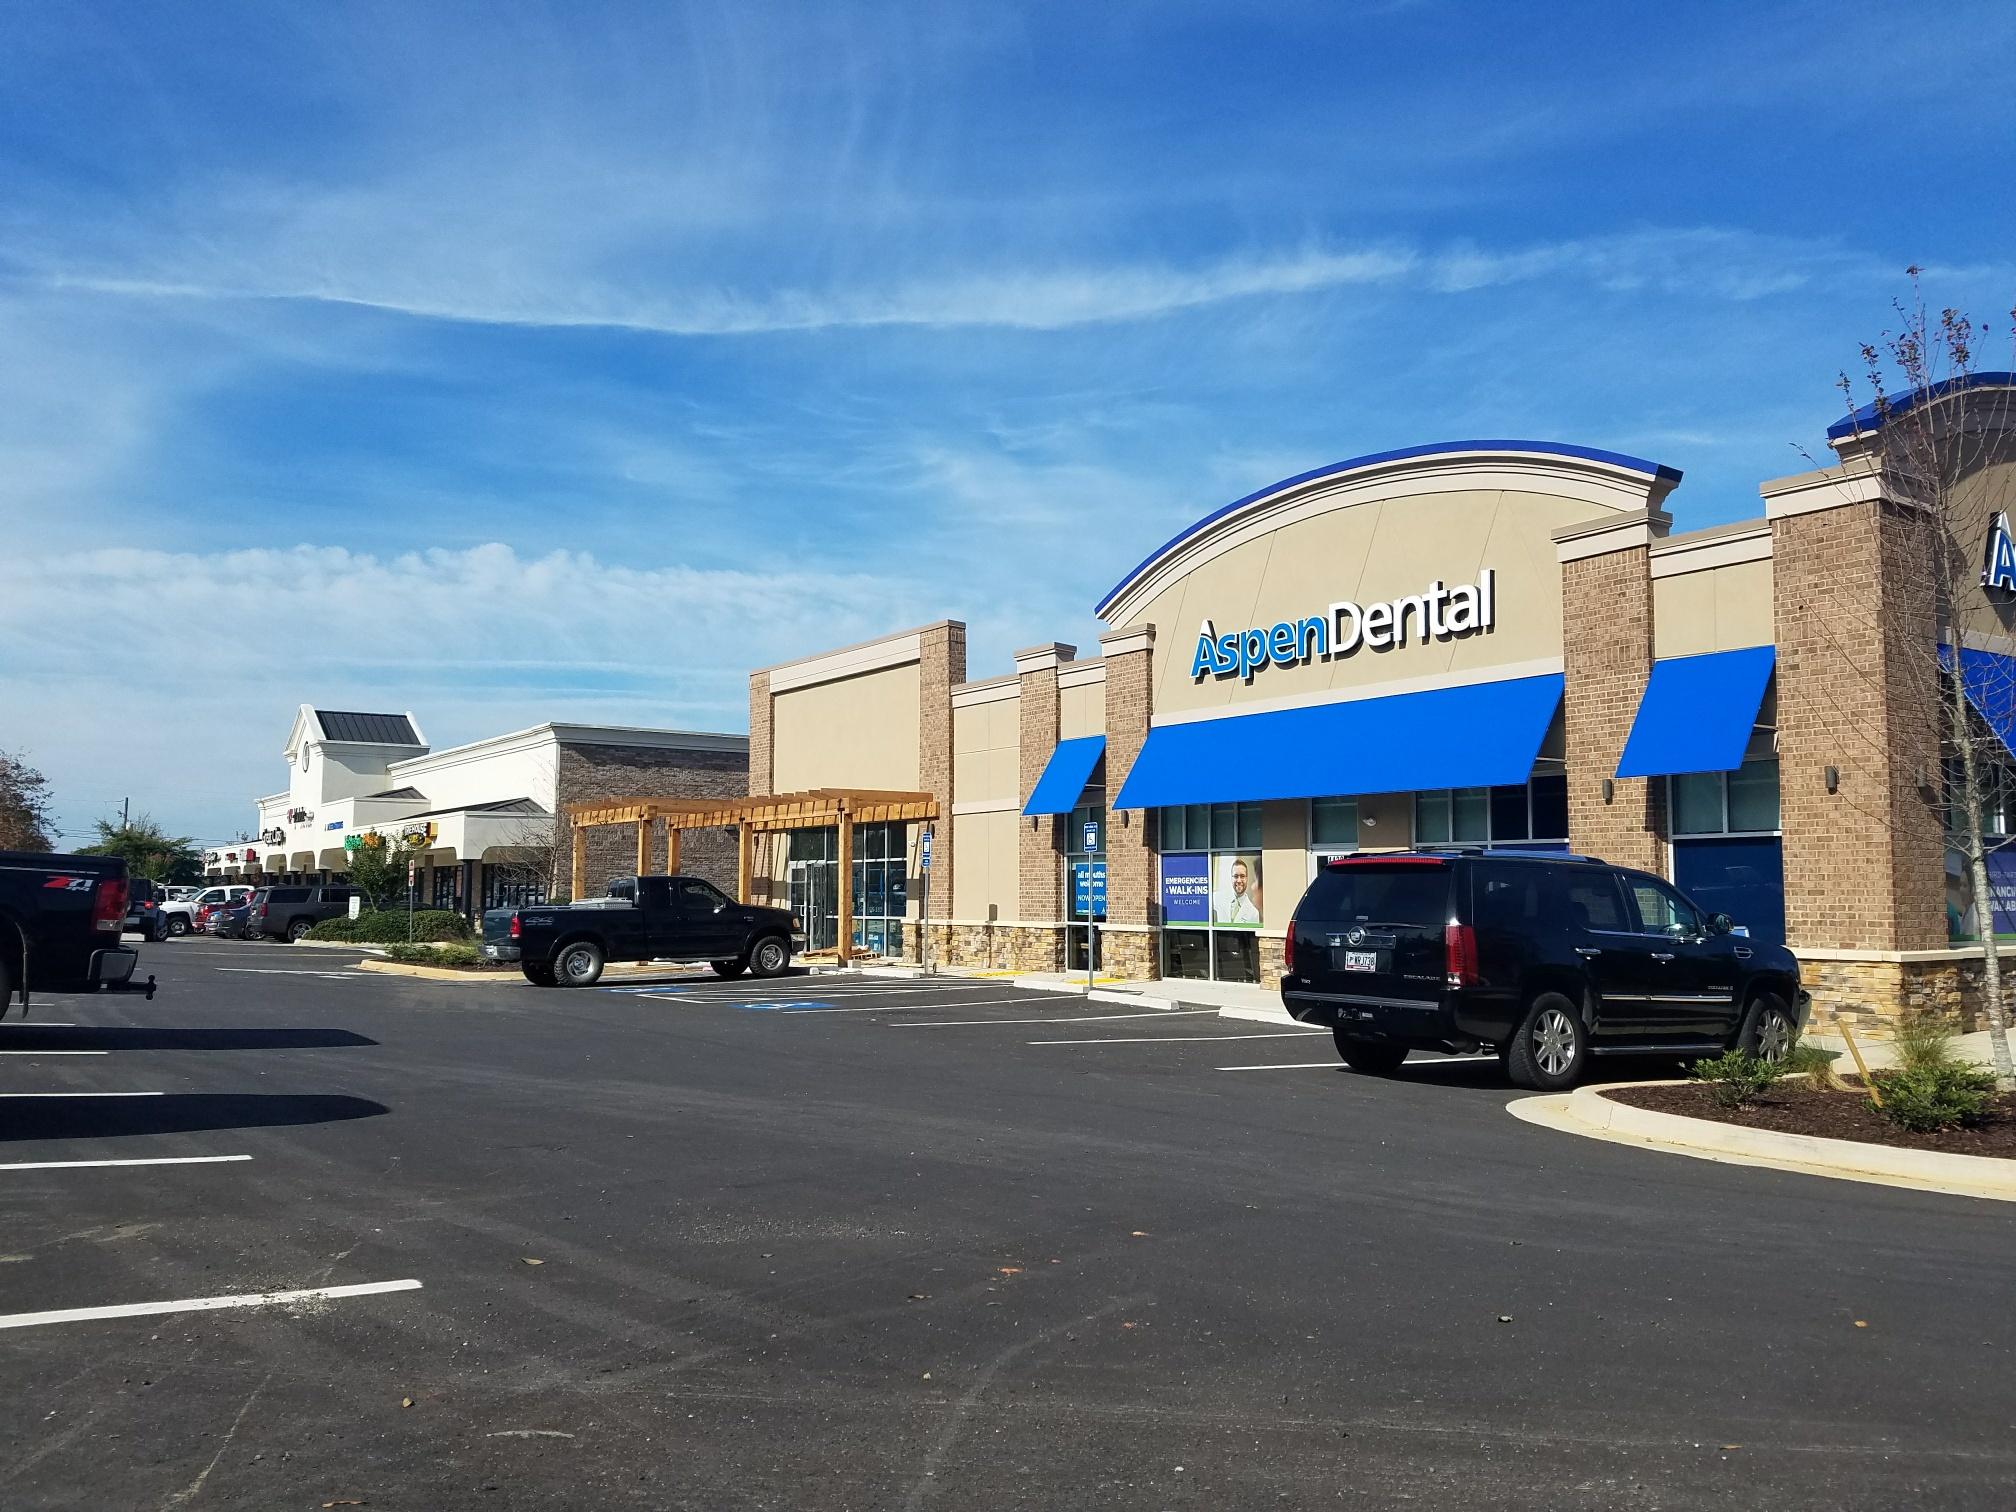 aspen dental building | Sherman and Hemstreet